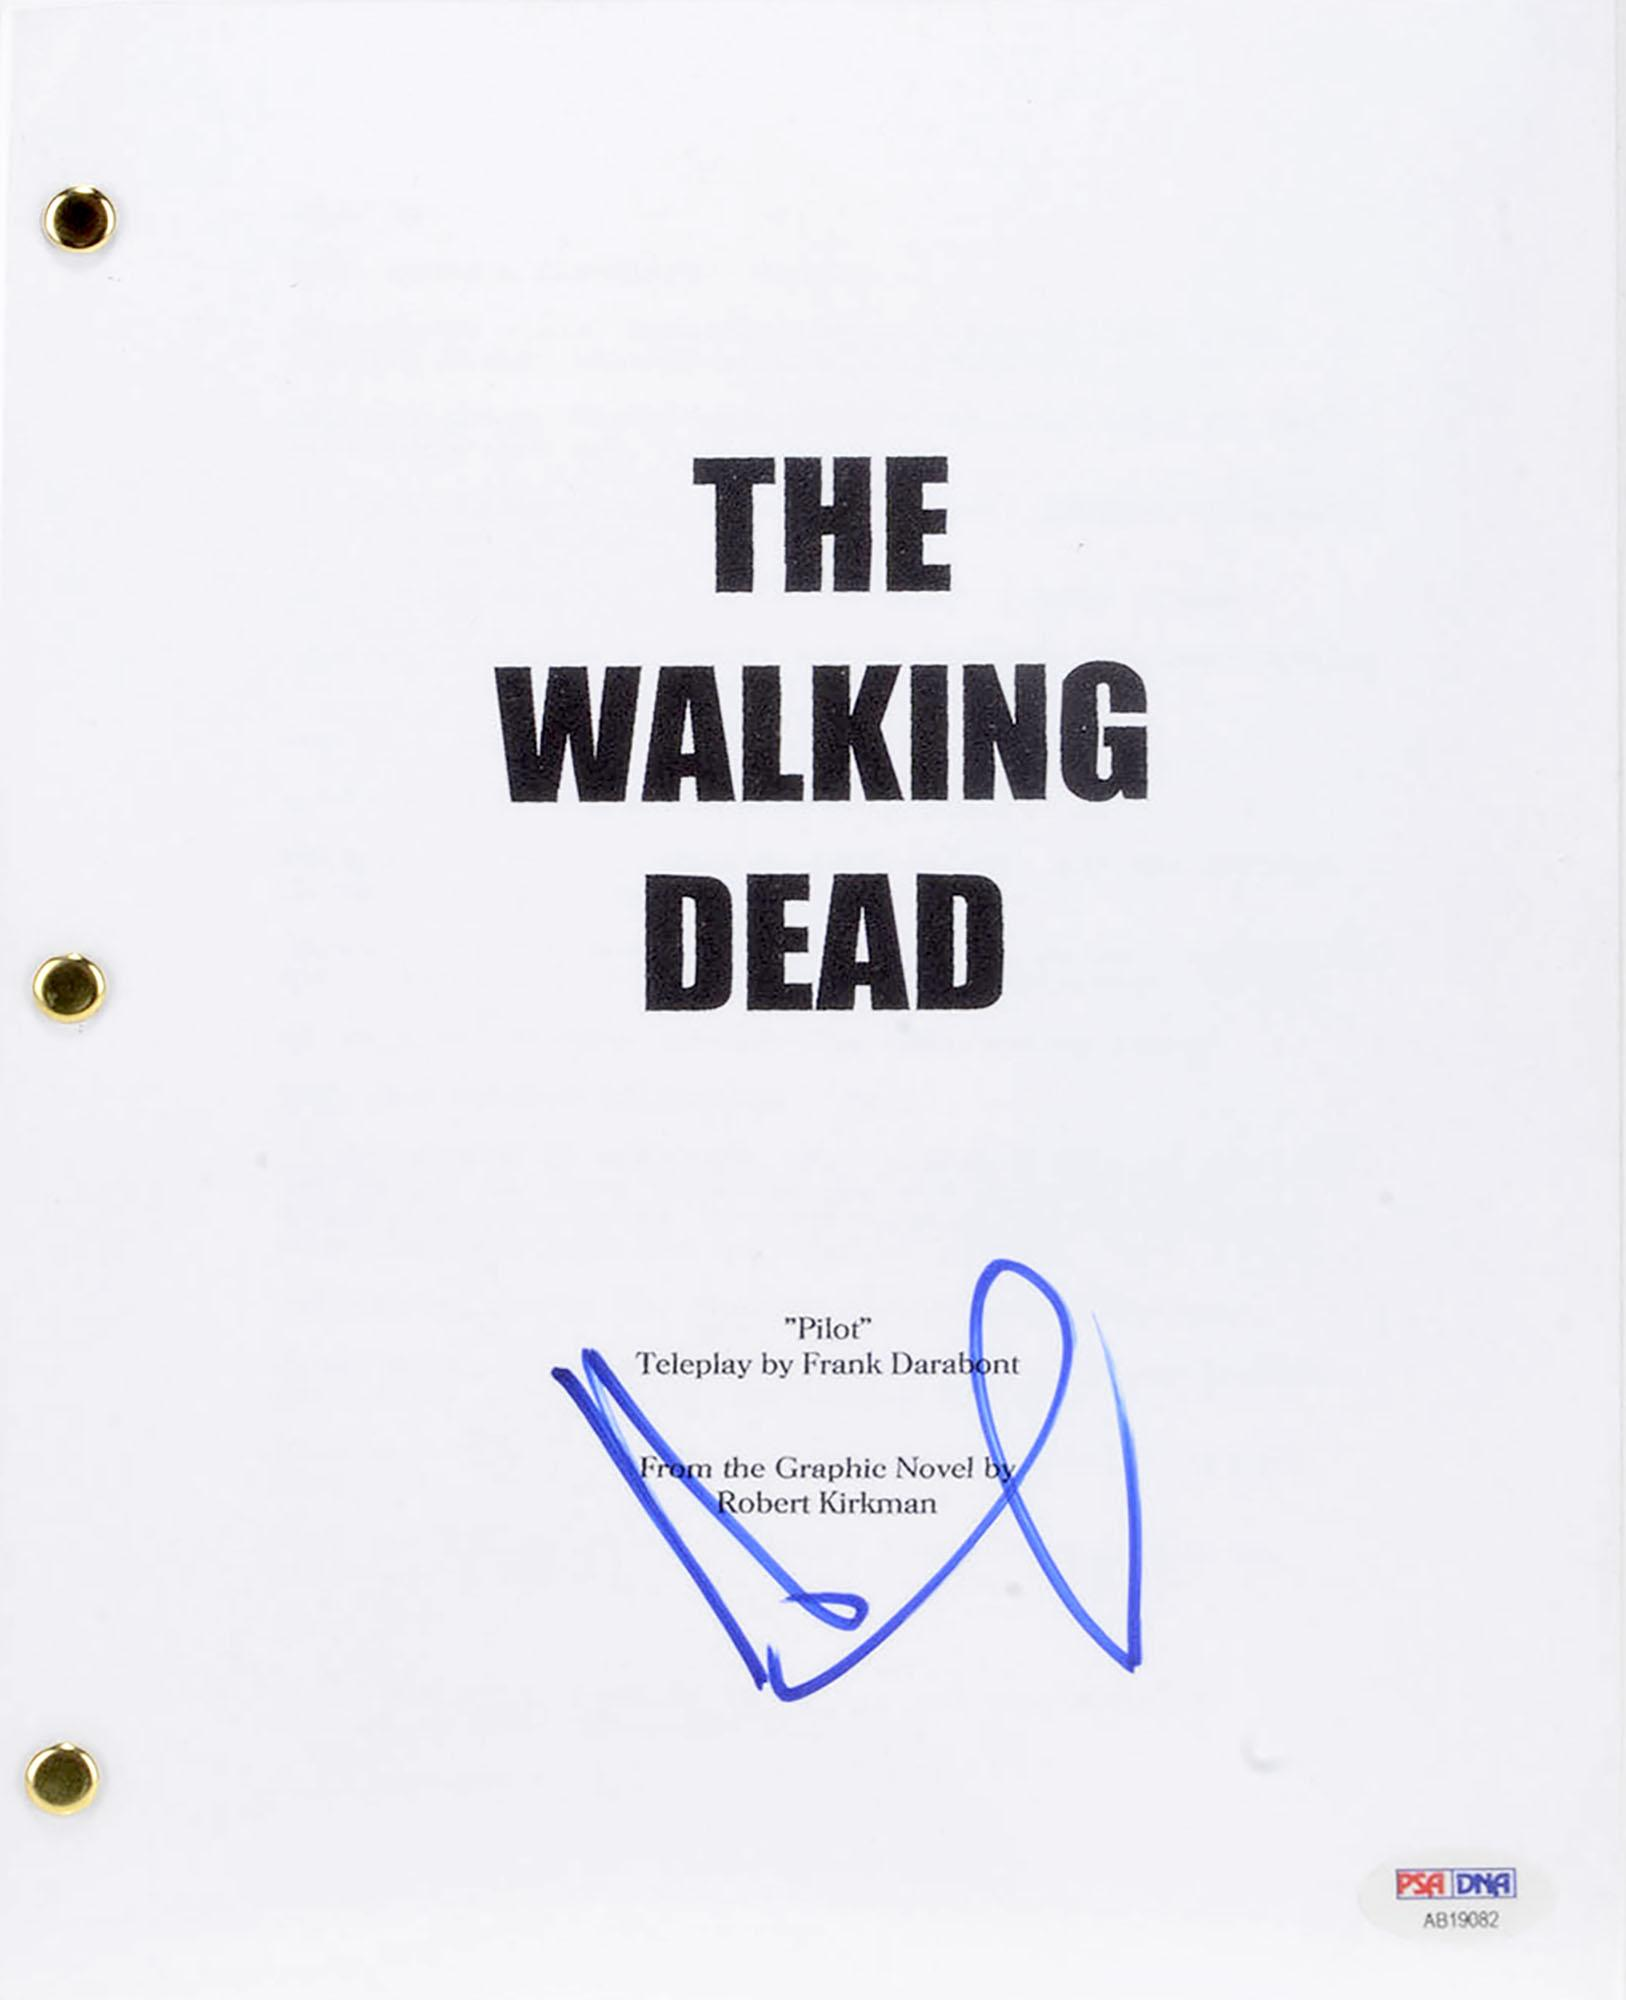 Andrew Lincoln Autographed The Walking Dead Replica Script - PSA/DNA